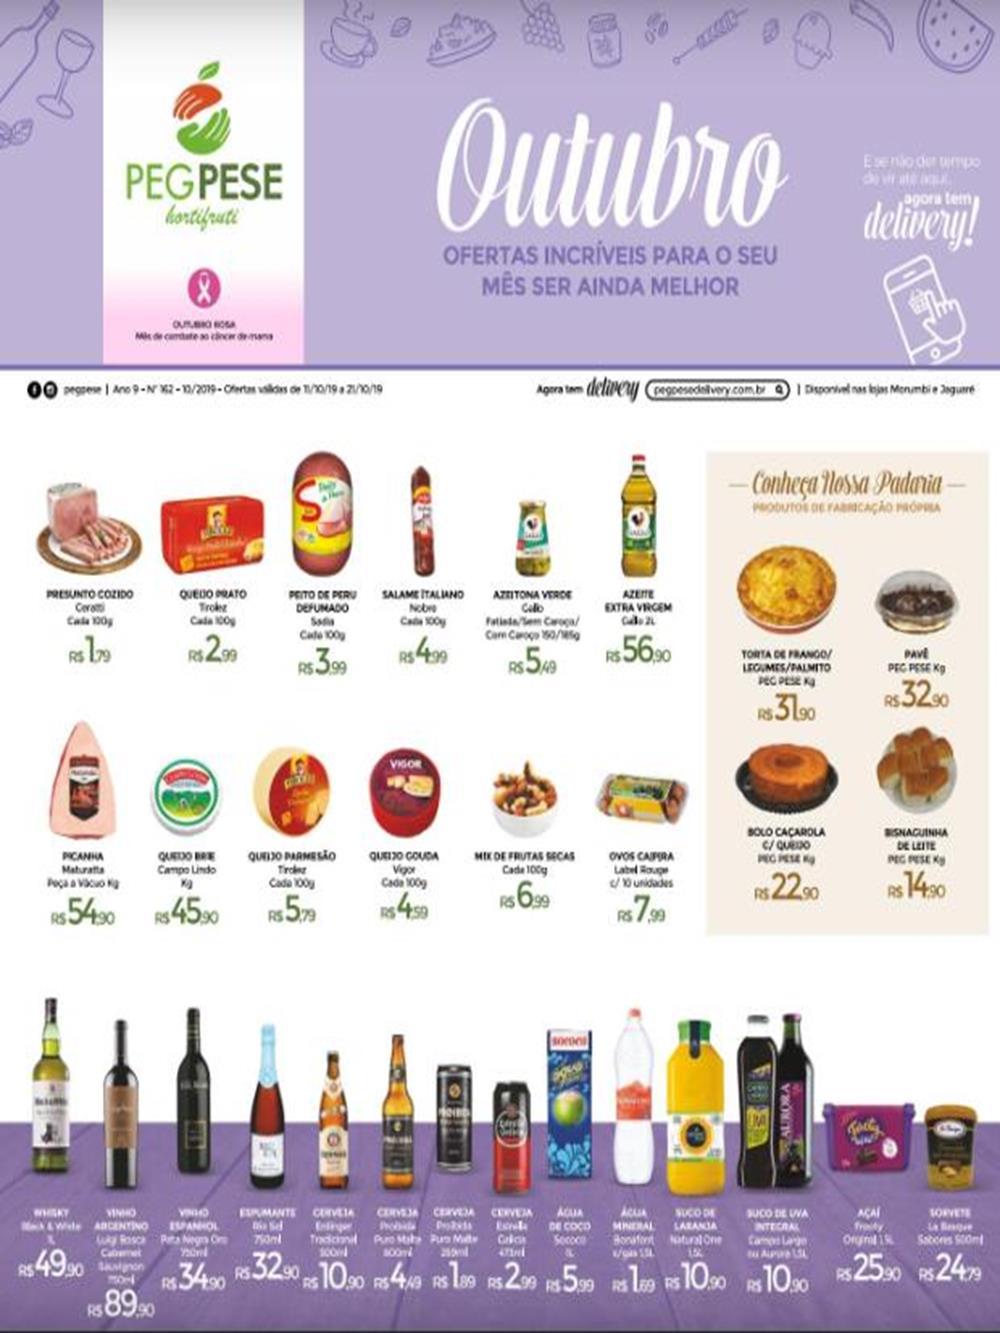 pegpese-Ofertas-Tabloide1 Ofertas de supermercados - Black Friday 2019